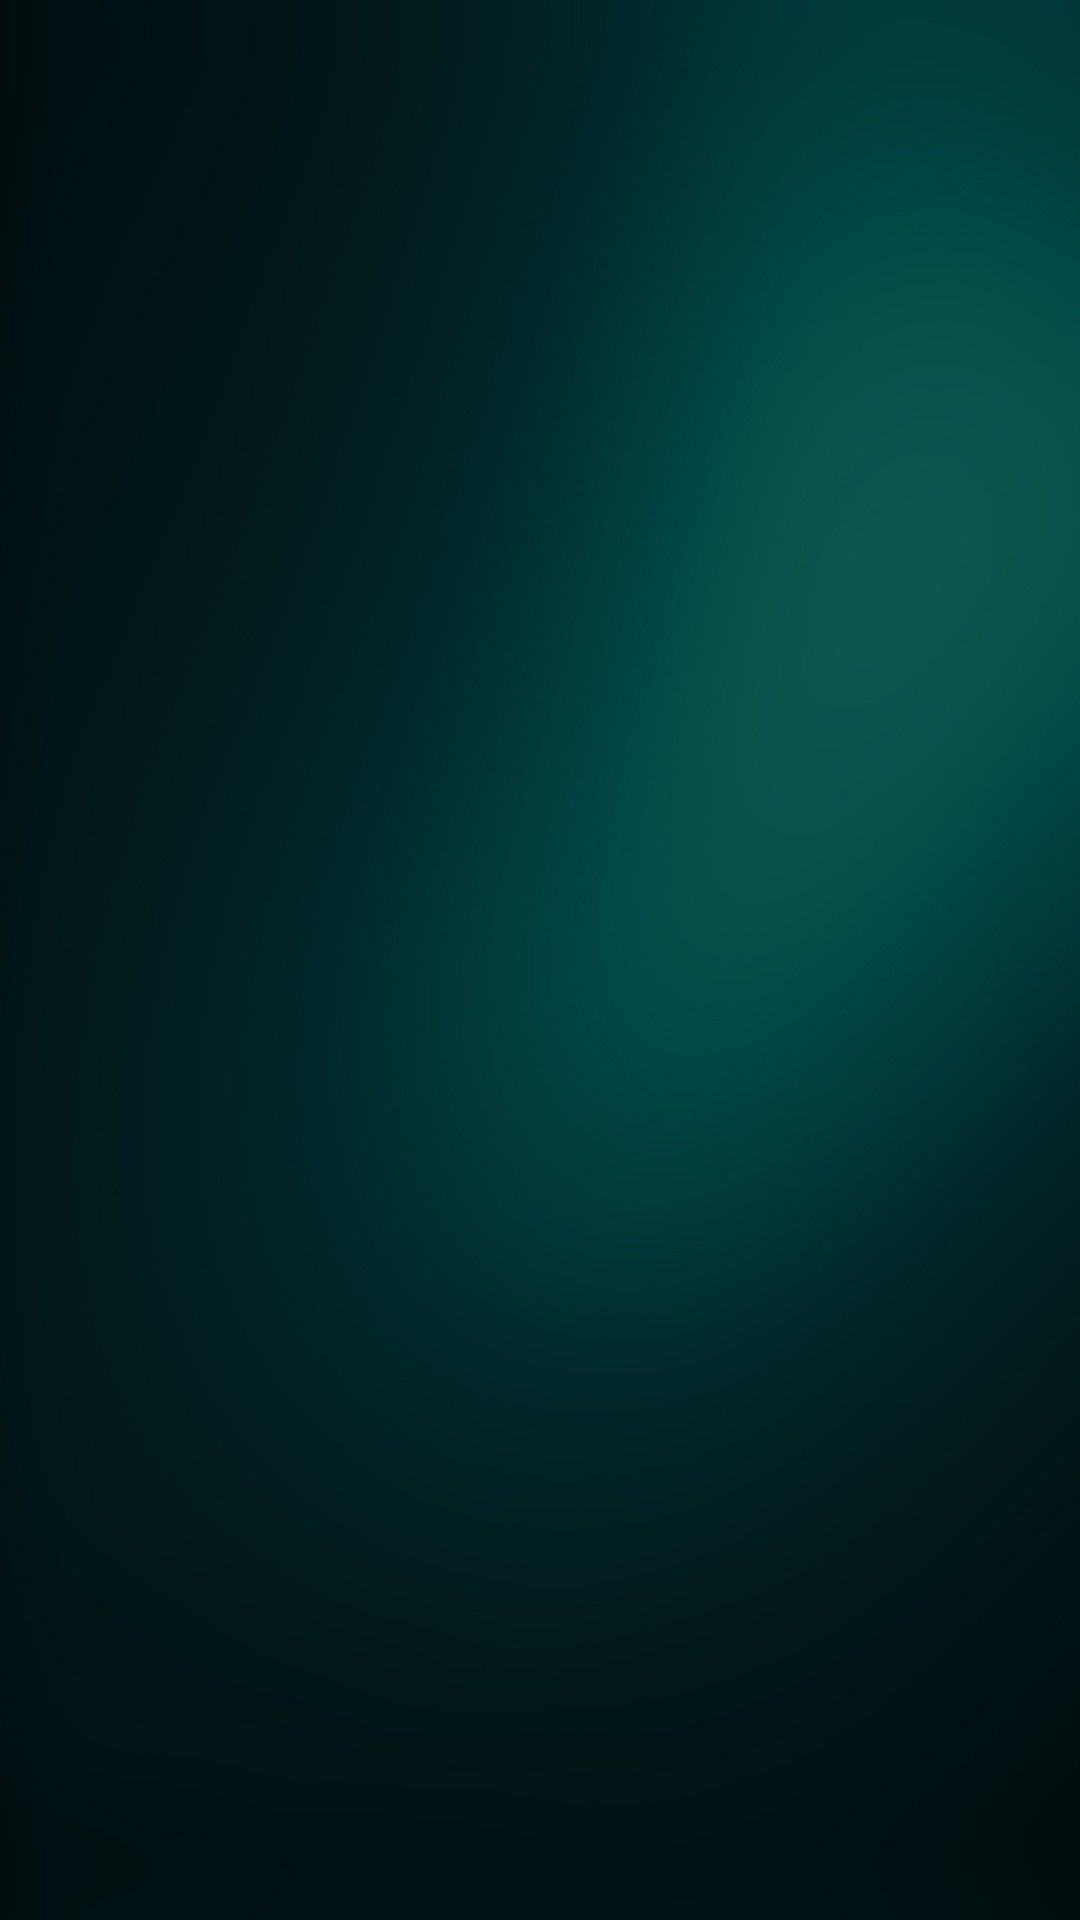 Dark Green Wallpaper Desktop